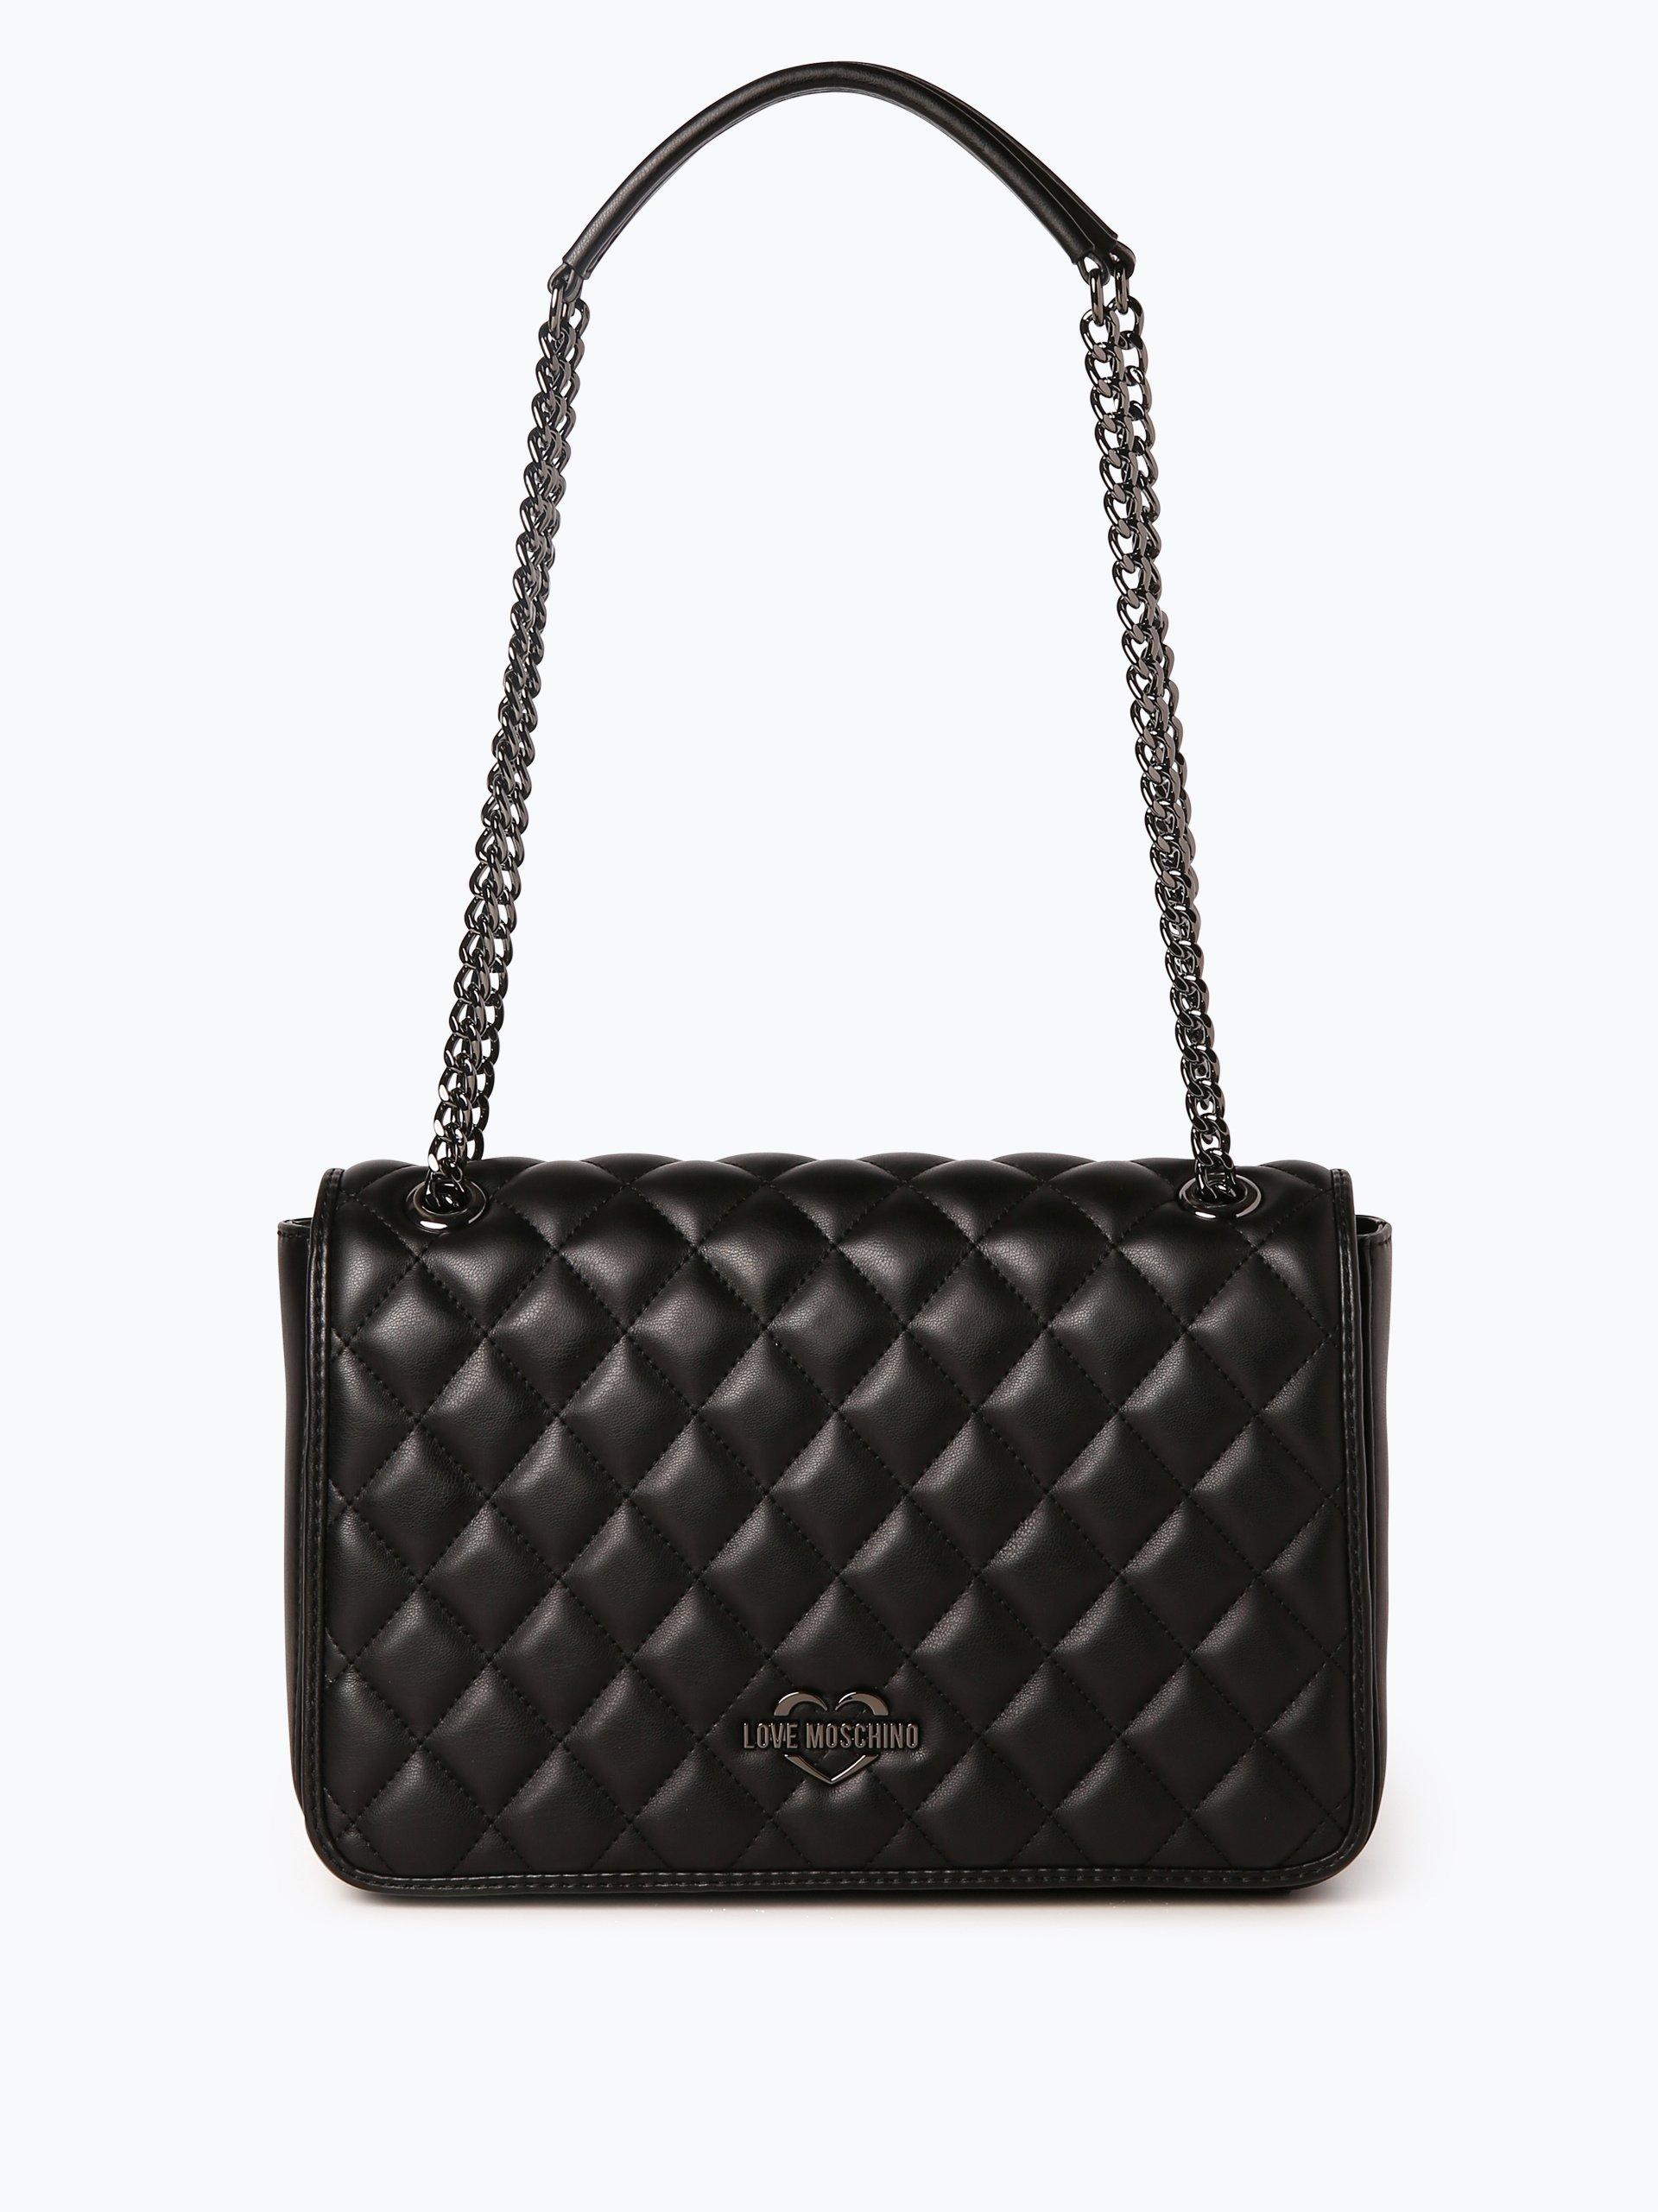 love moschino damen handtasche schwarz uni online kaufen vangraaf com. Black Bedroom Furniture Sets. Home Design Ideas